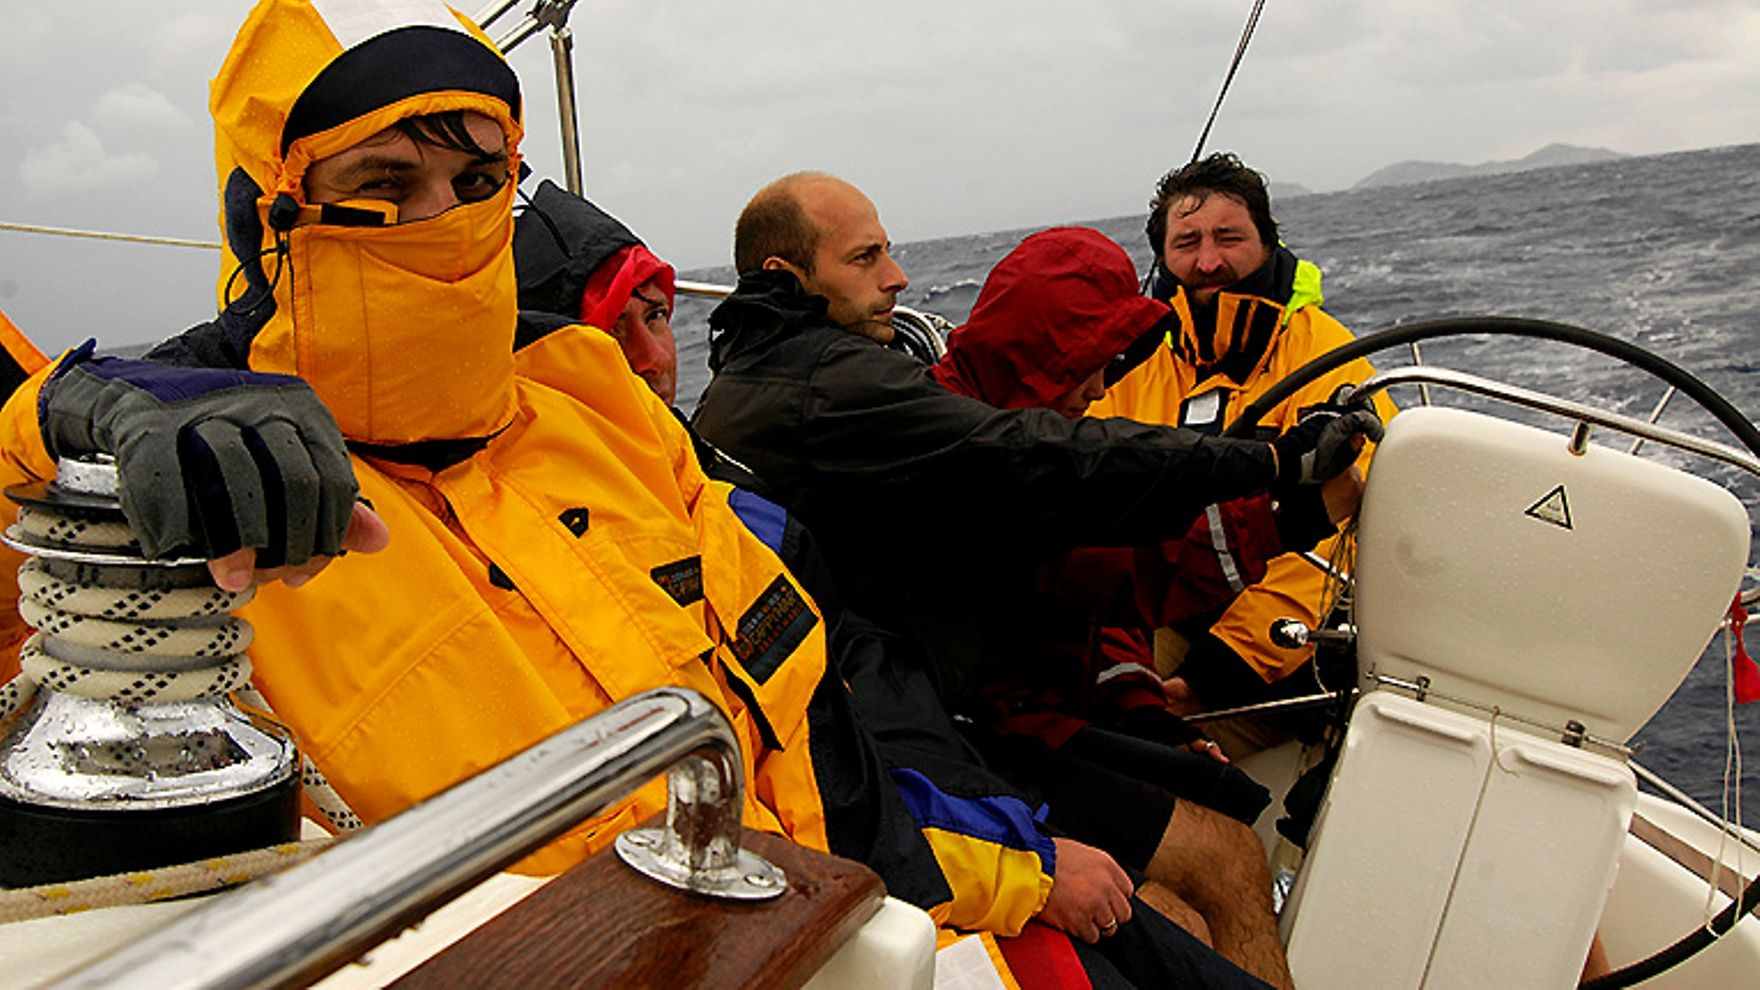 IYT Bareboat Captain sailing practice